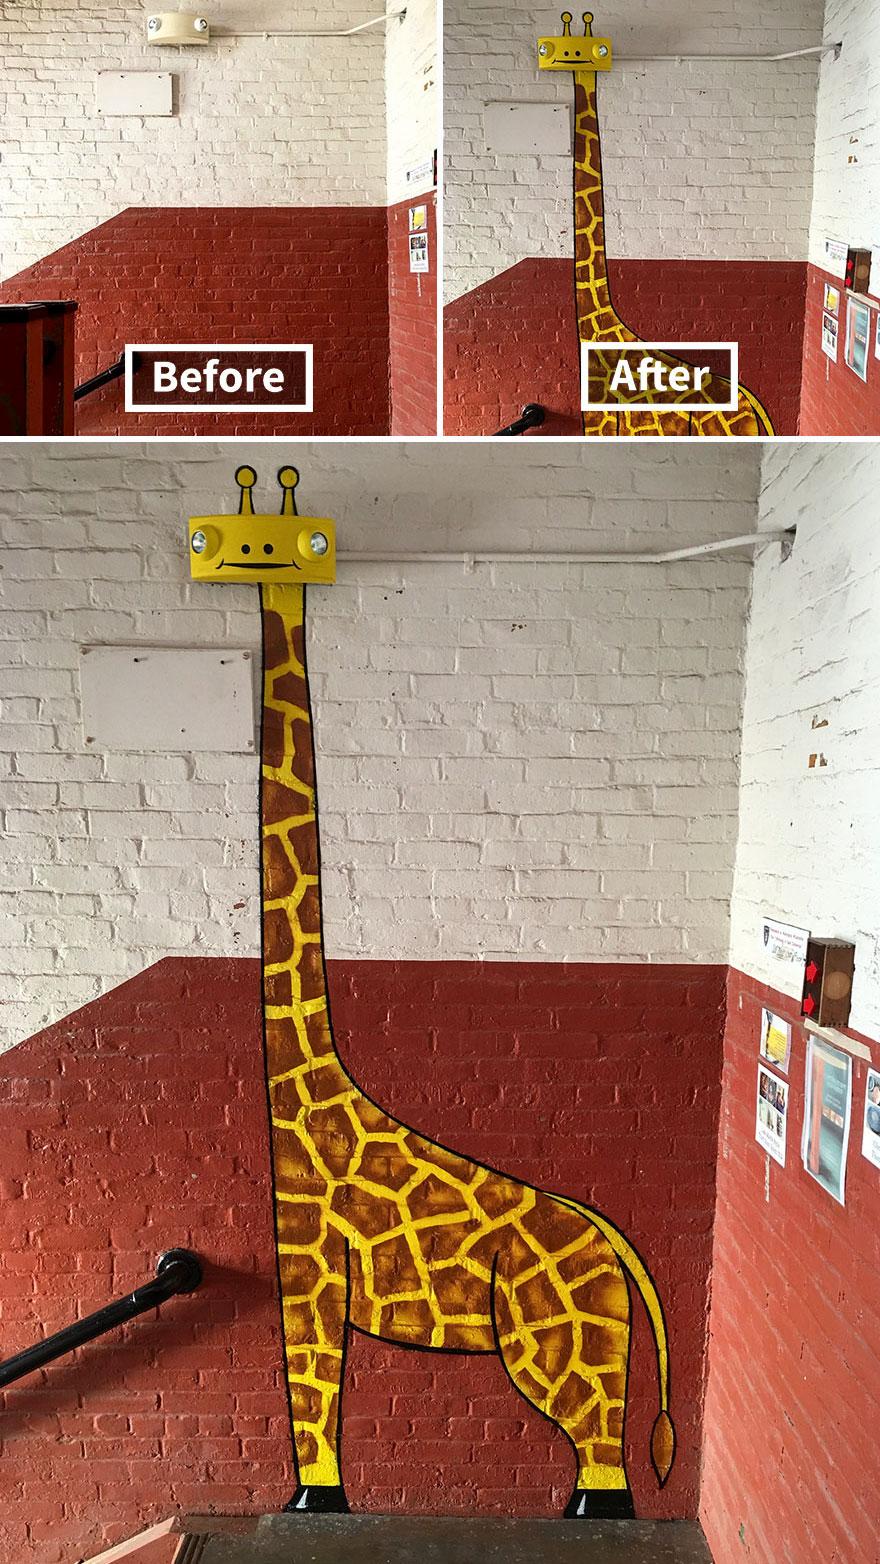 нарисованный жираф